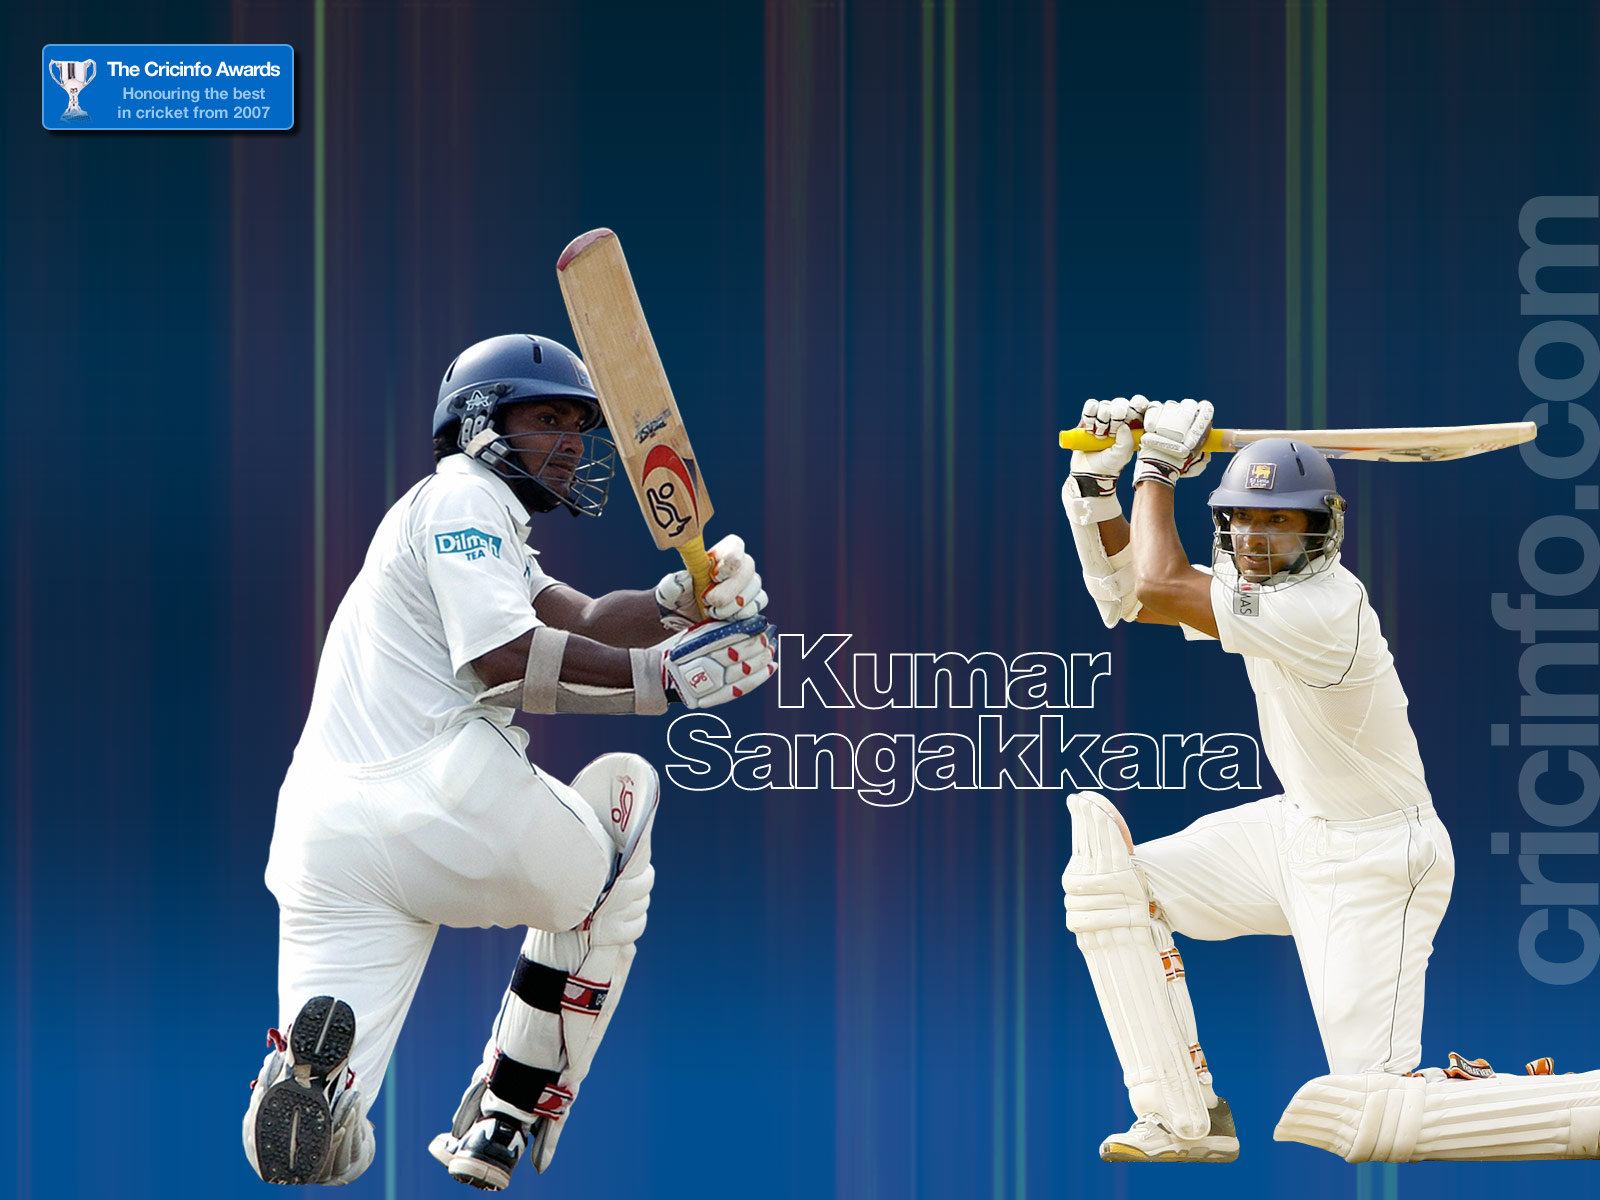 Kumar Sangakkara, winner Test batting